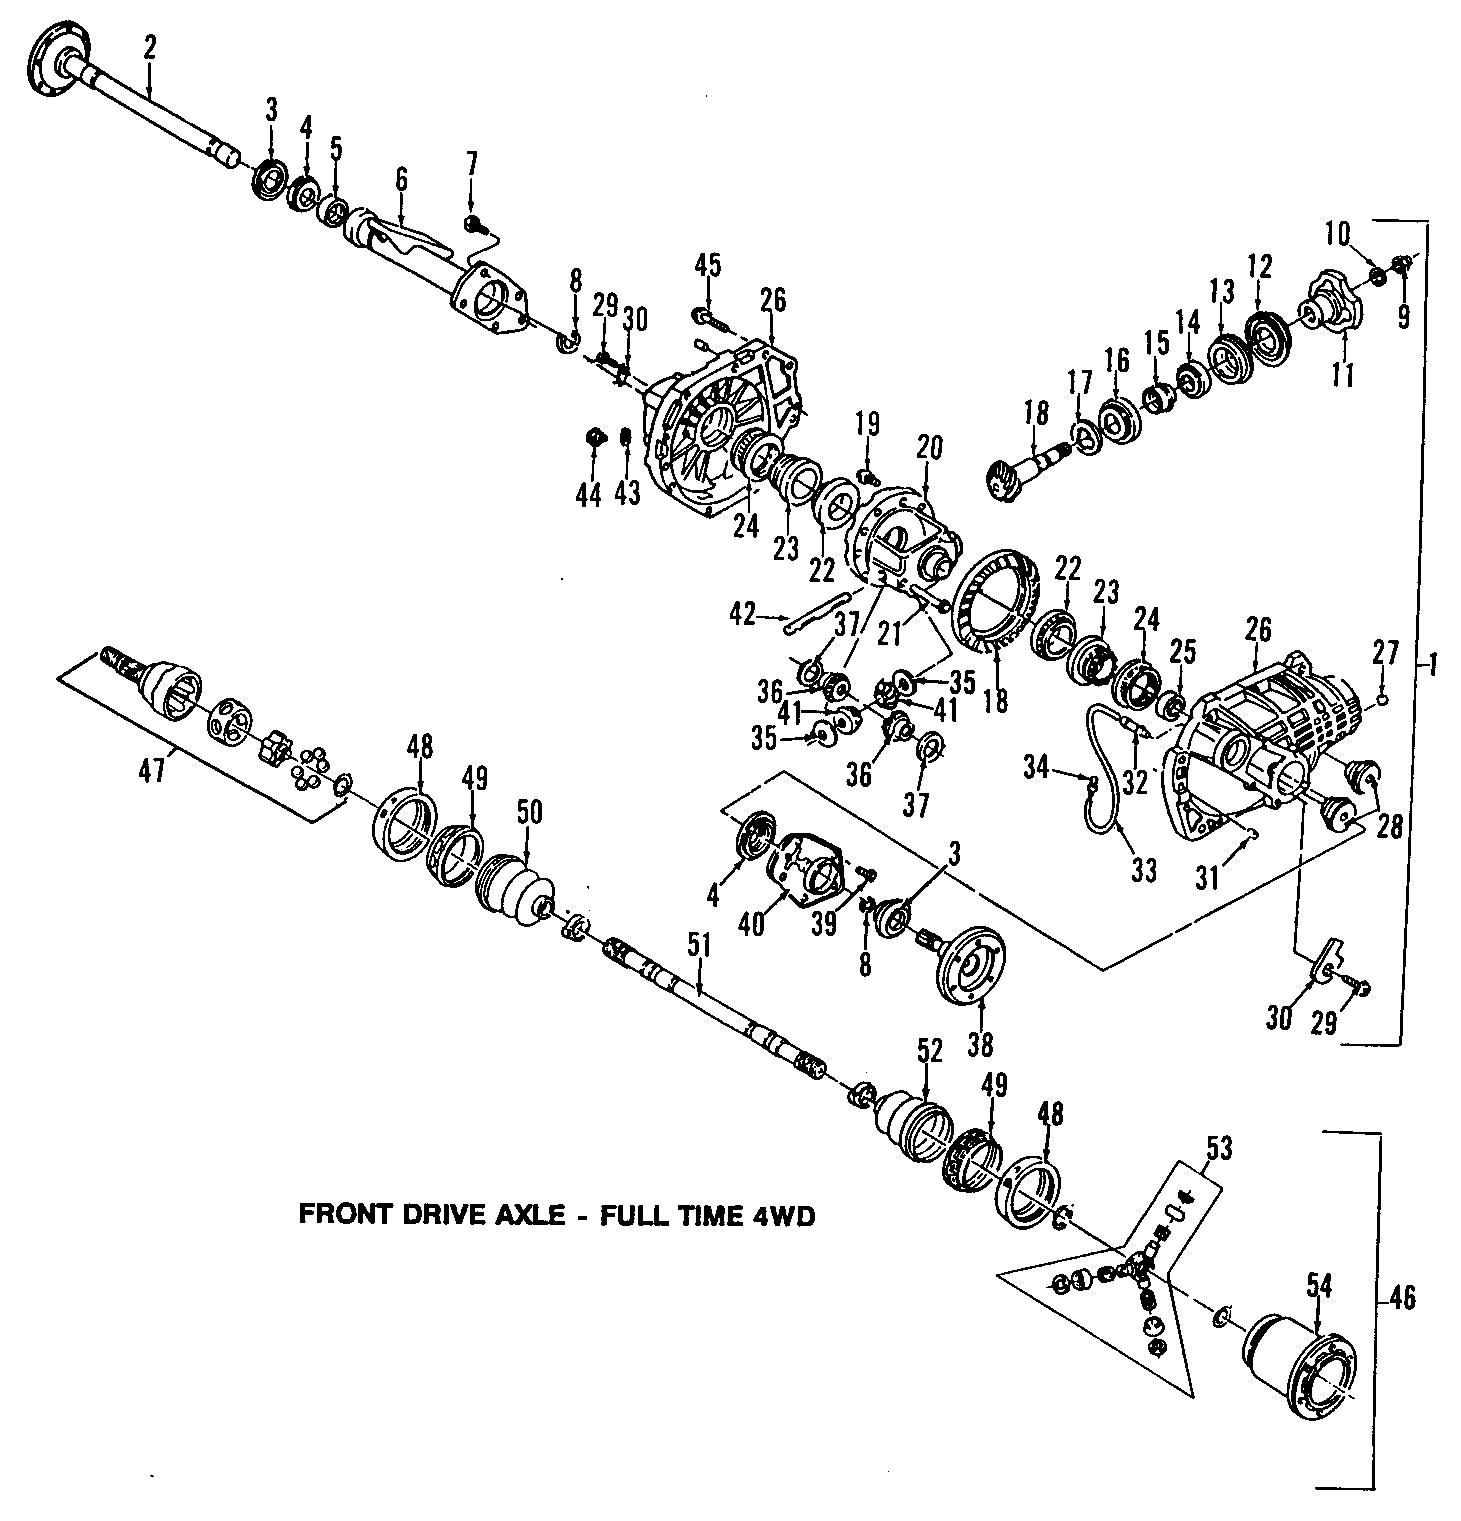 Axle Housing Tube